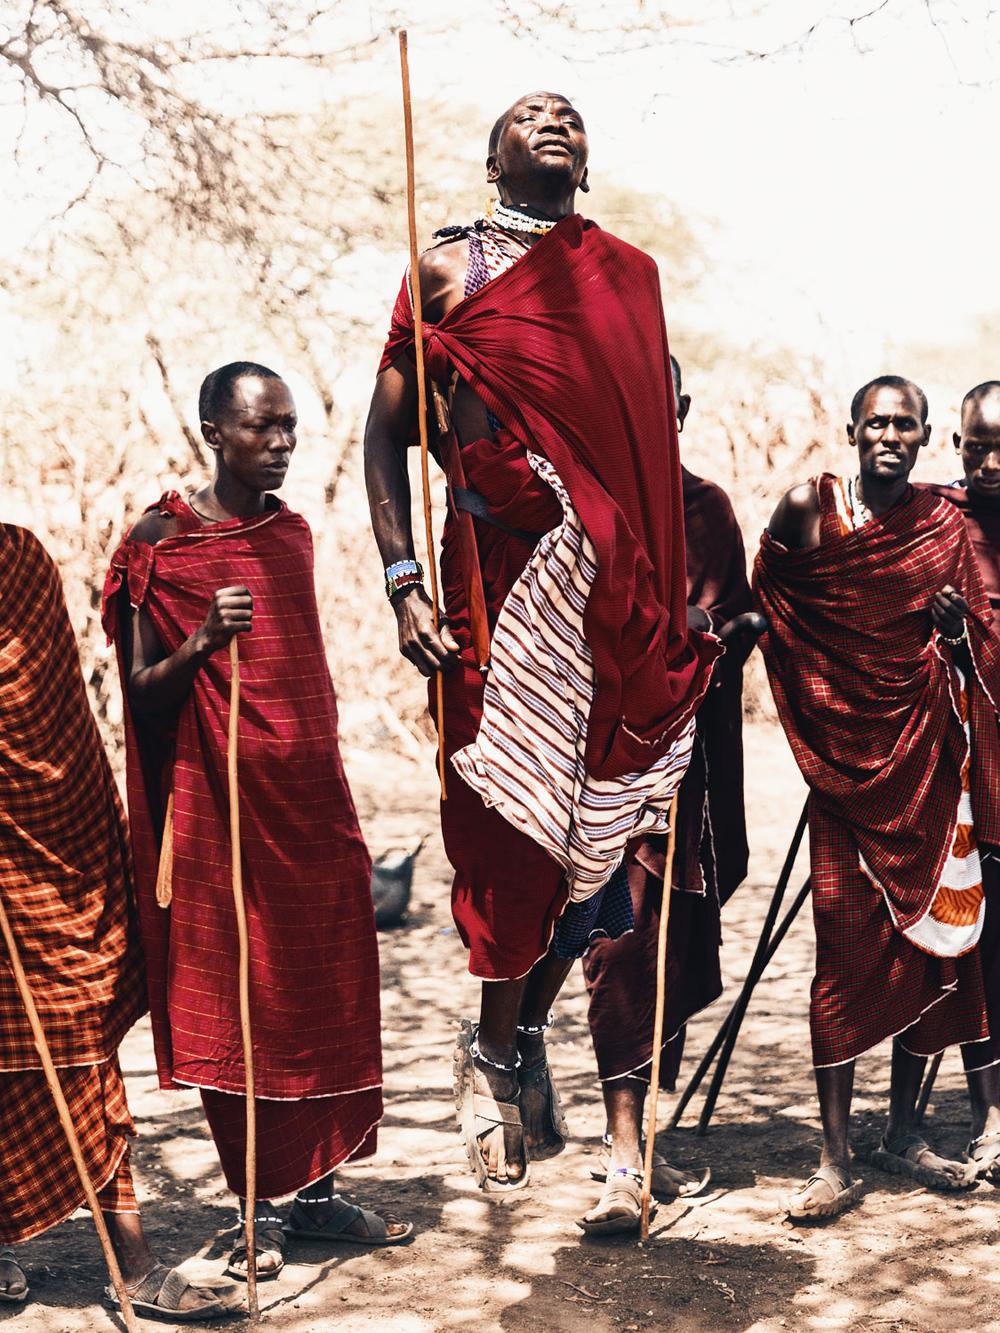 CallieGiovanna_Africa_Tanzania_MalangaVillage_20150101_07362.jpg